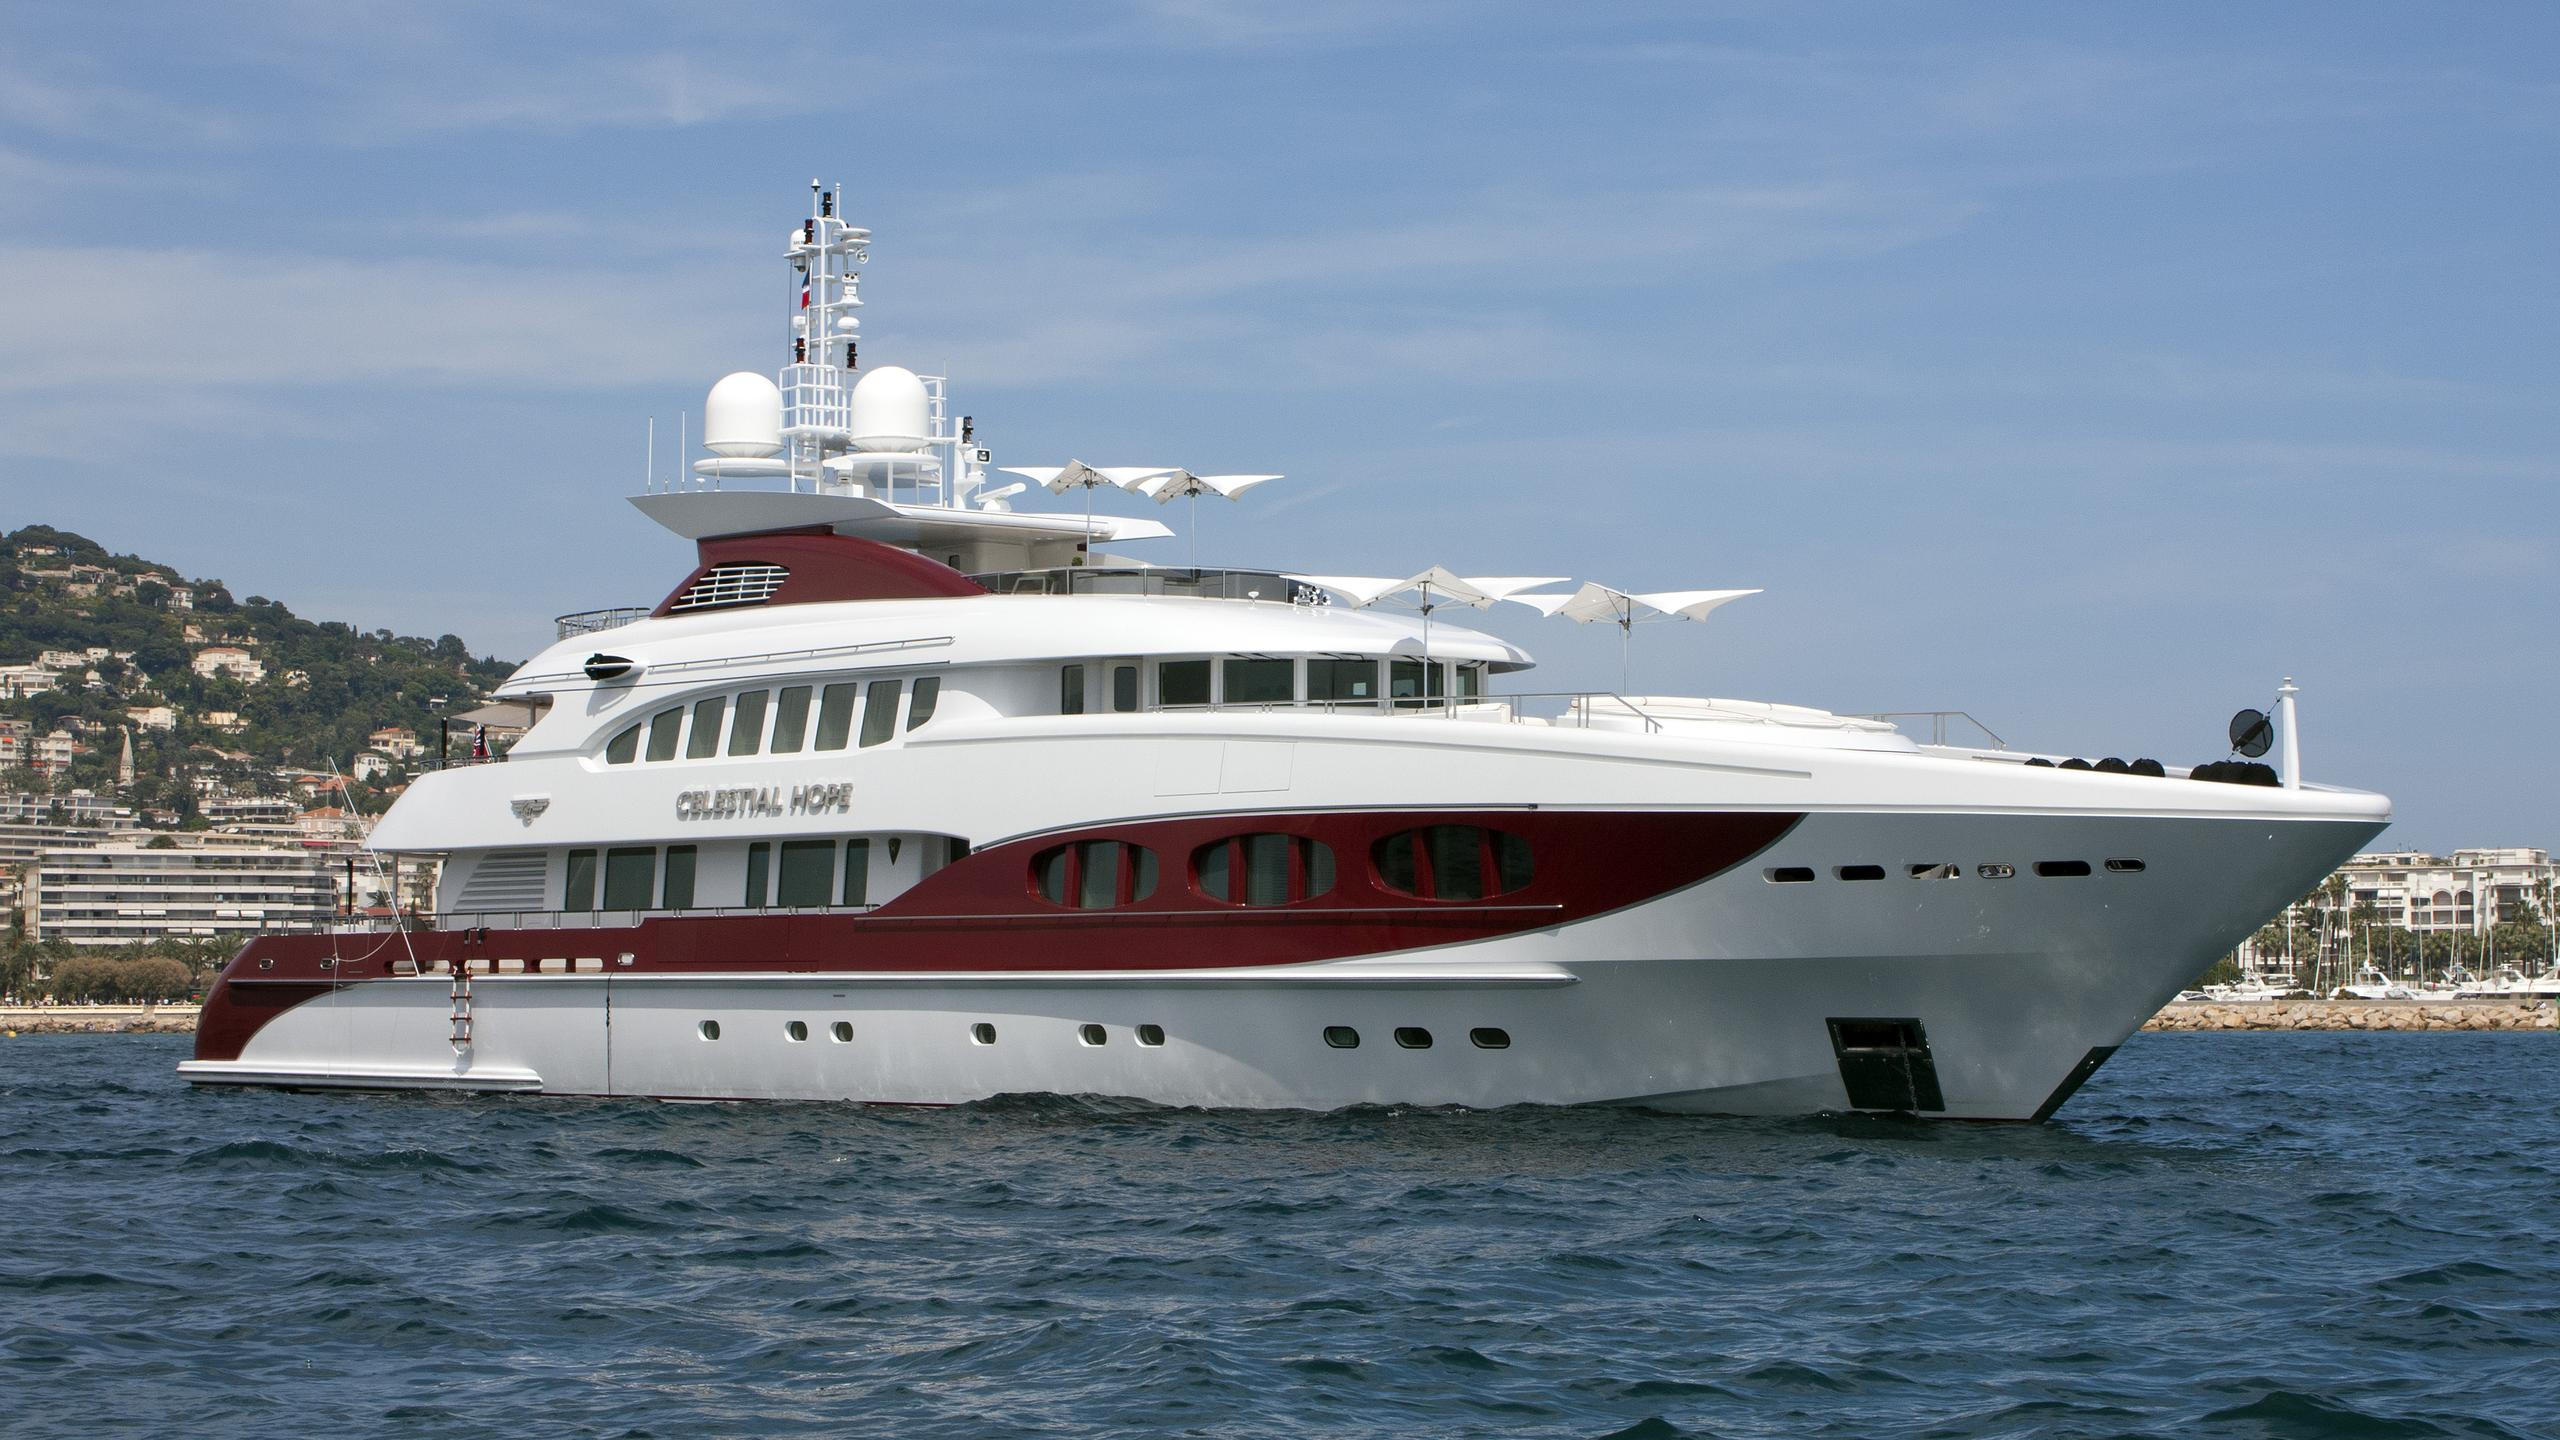 celestial-hope-motor-yacht-hessen-4700-2008-47m-half-profile